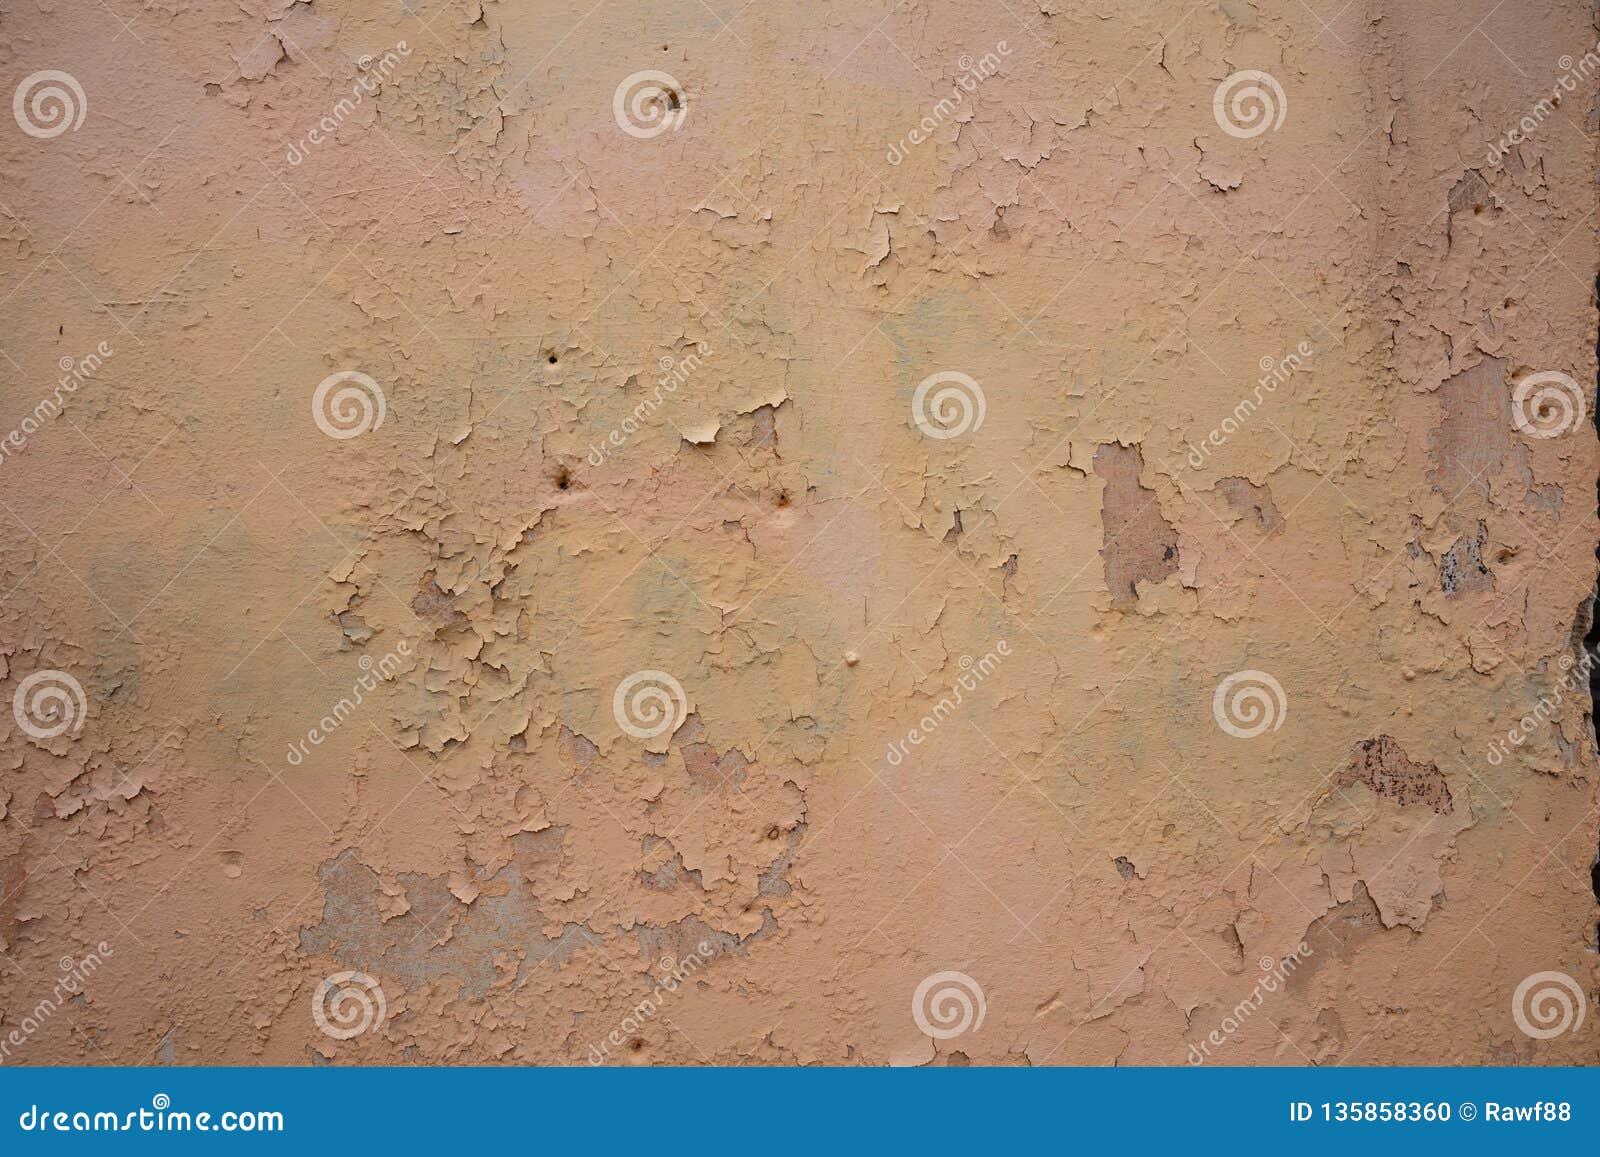 Couleur brun clair, fond grunge peint de texture de mur